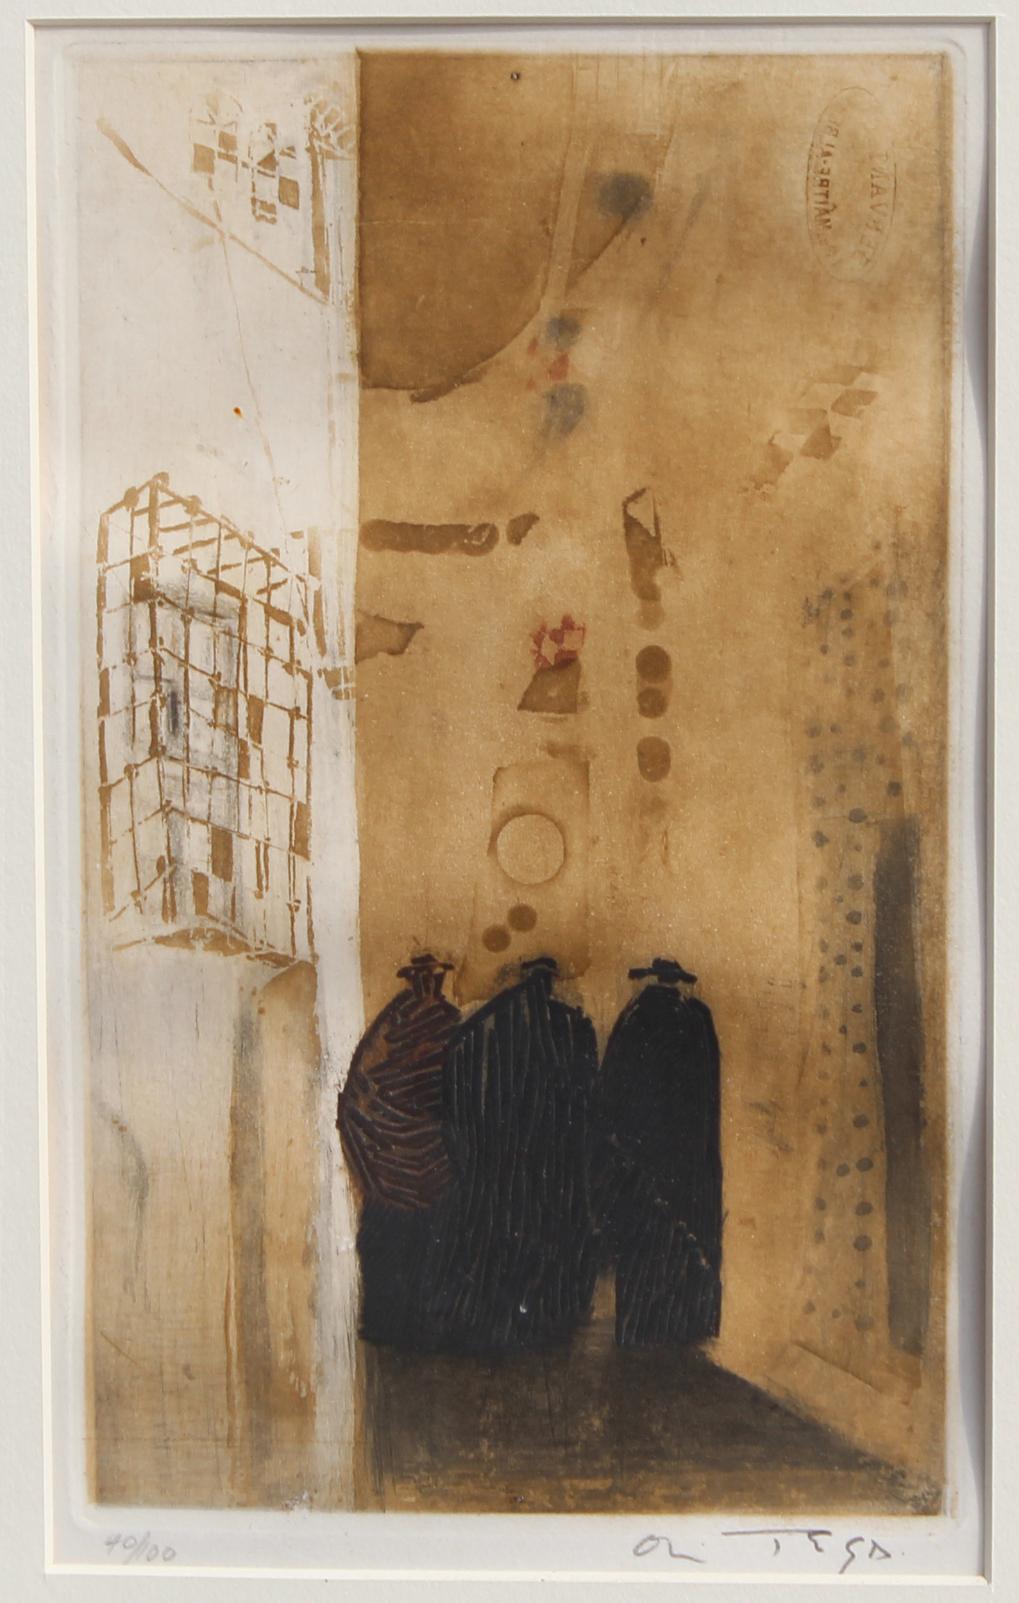 Jose Ortega (Spain, 1921- 1991) Etching - Image 2 of 3